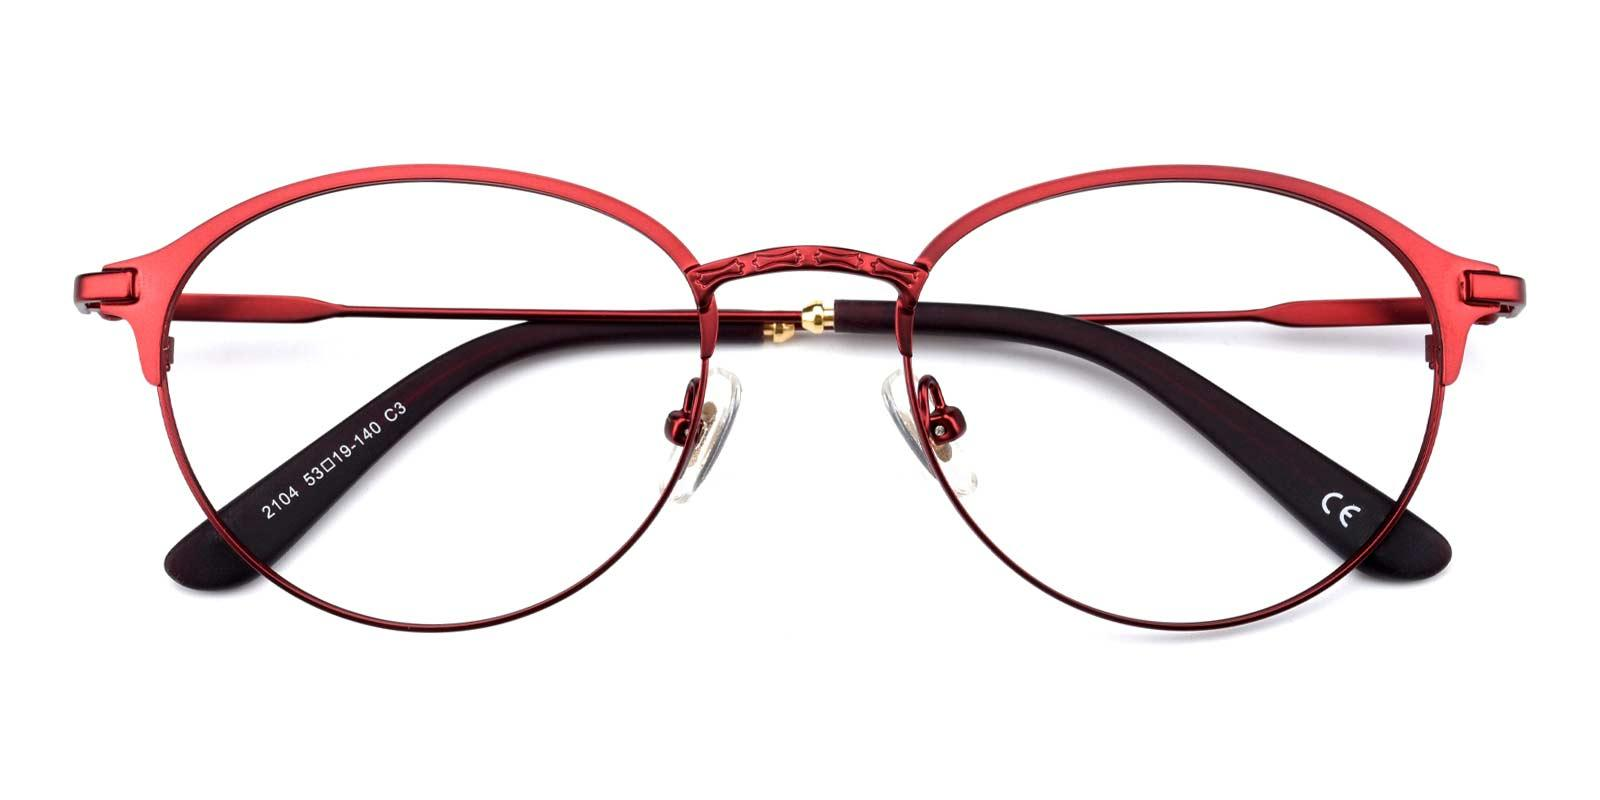 Jean-Red-Round-Metal-Eyeglasses-detail